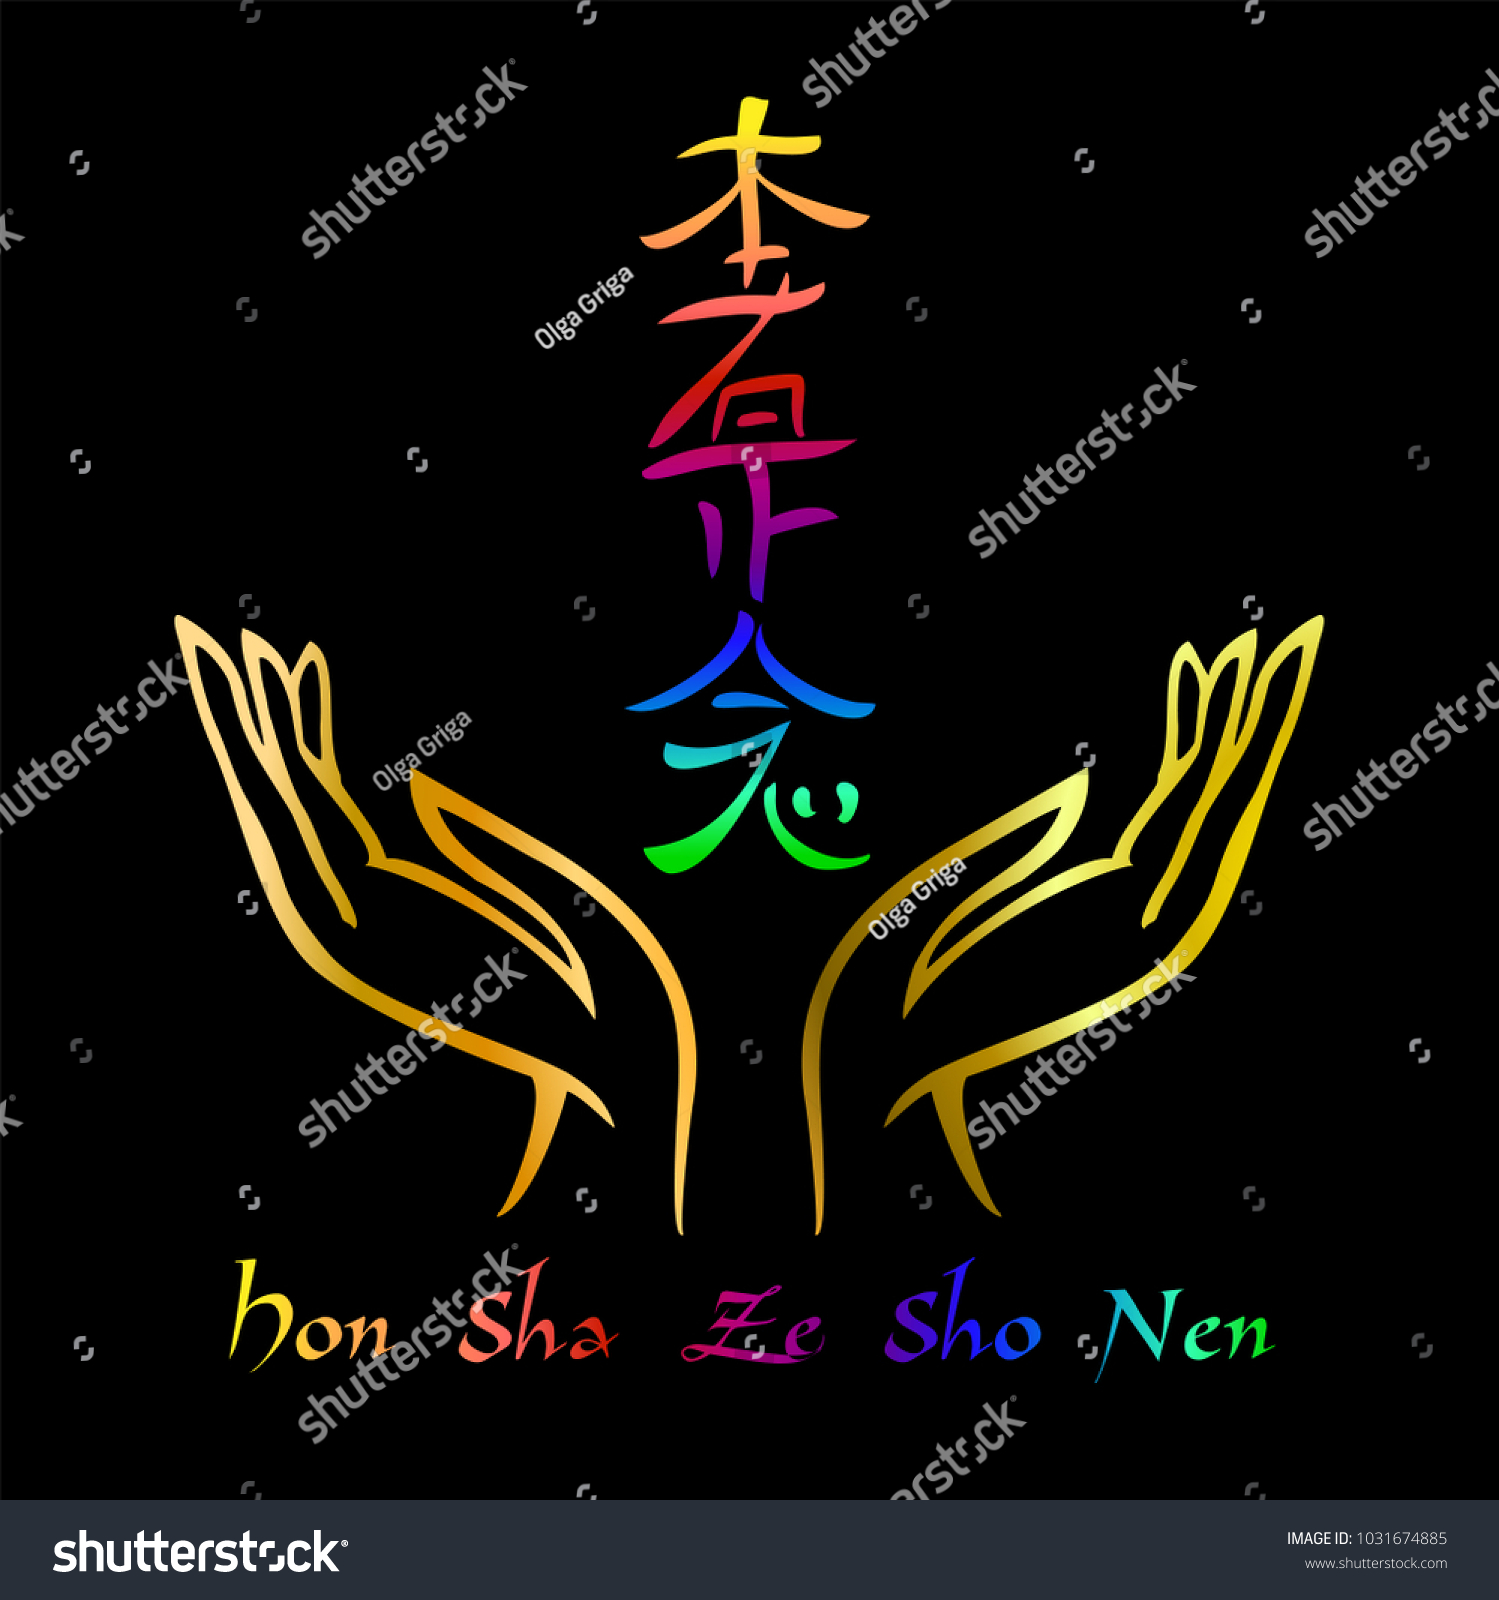 Honshazeshonen reiki symbol gallery symbol and sign ideas reiki symbol sacred sign hon sha stock vector 1031674885 reiki symbol a sacred sign hon sha buycottarizona